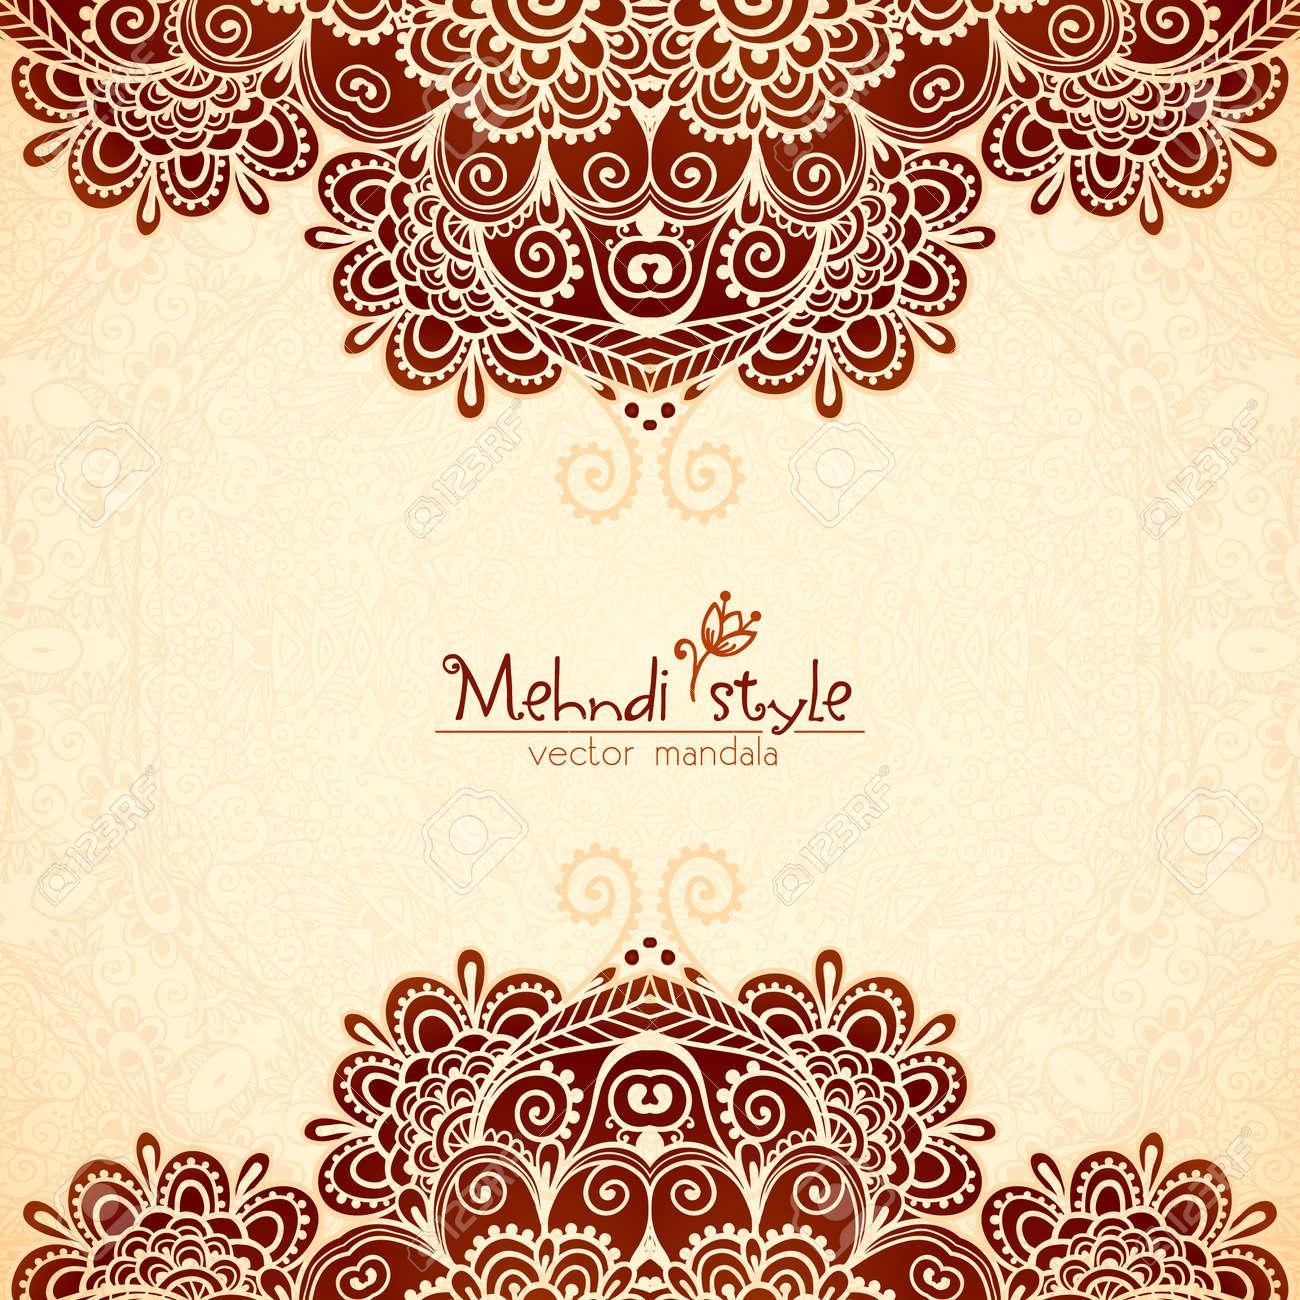 Ornate vintage vector background in mehndi style royalty free stock - Vector Vintage Flowers Ethnic Background In Indian Mehndi Style Stock Vector 45598063